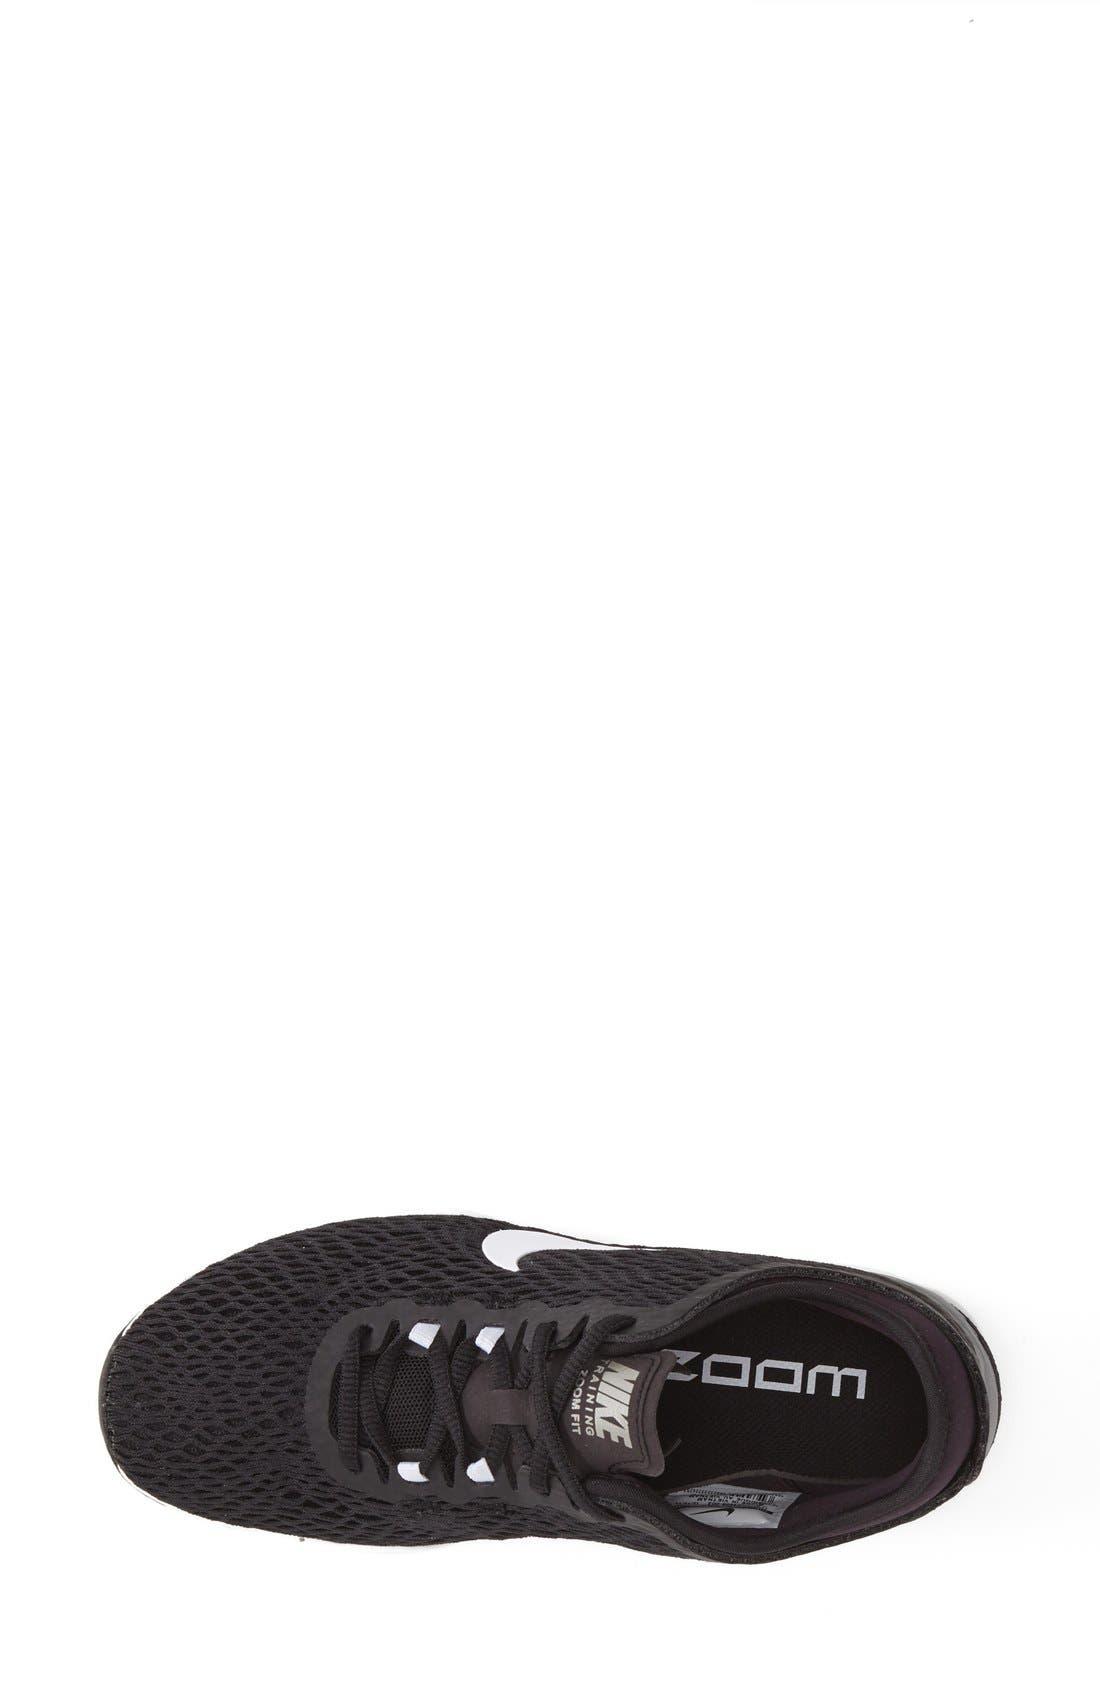 Alternate Image 3  - Nike 'Zoom Fit' Mesh Training Shoe (Women)